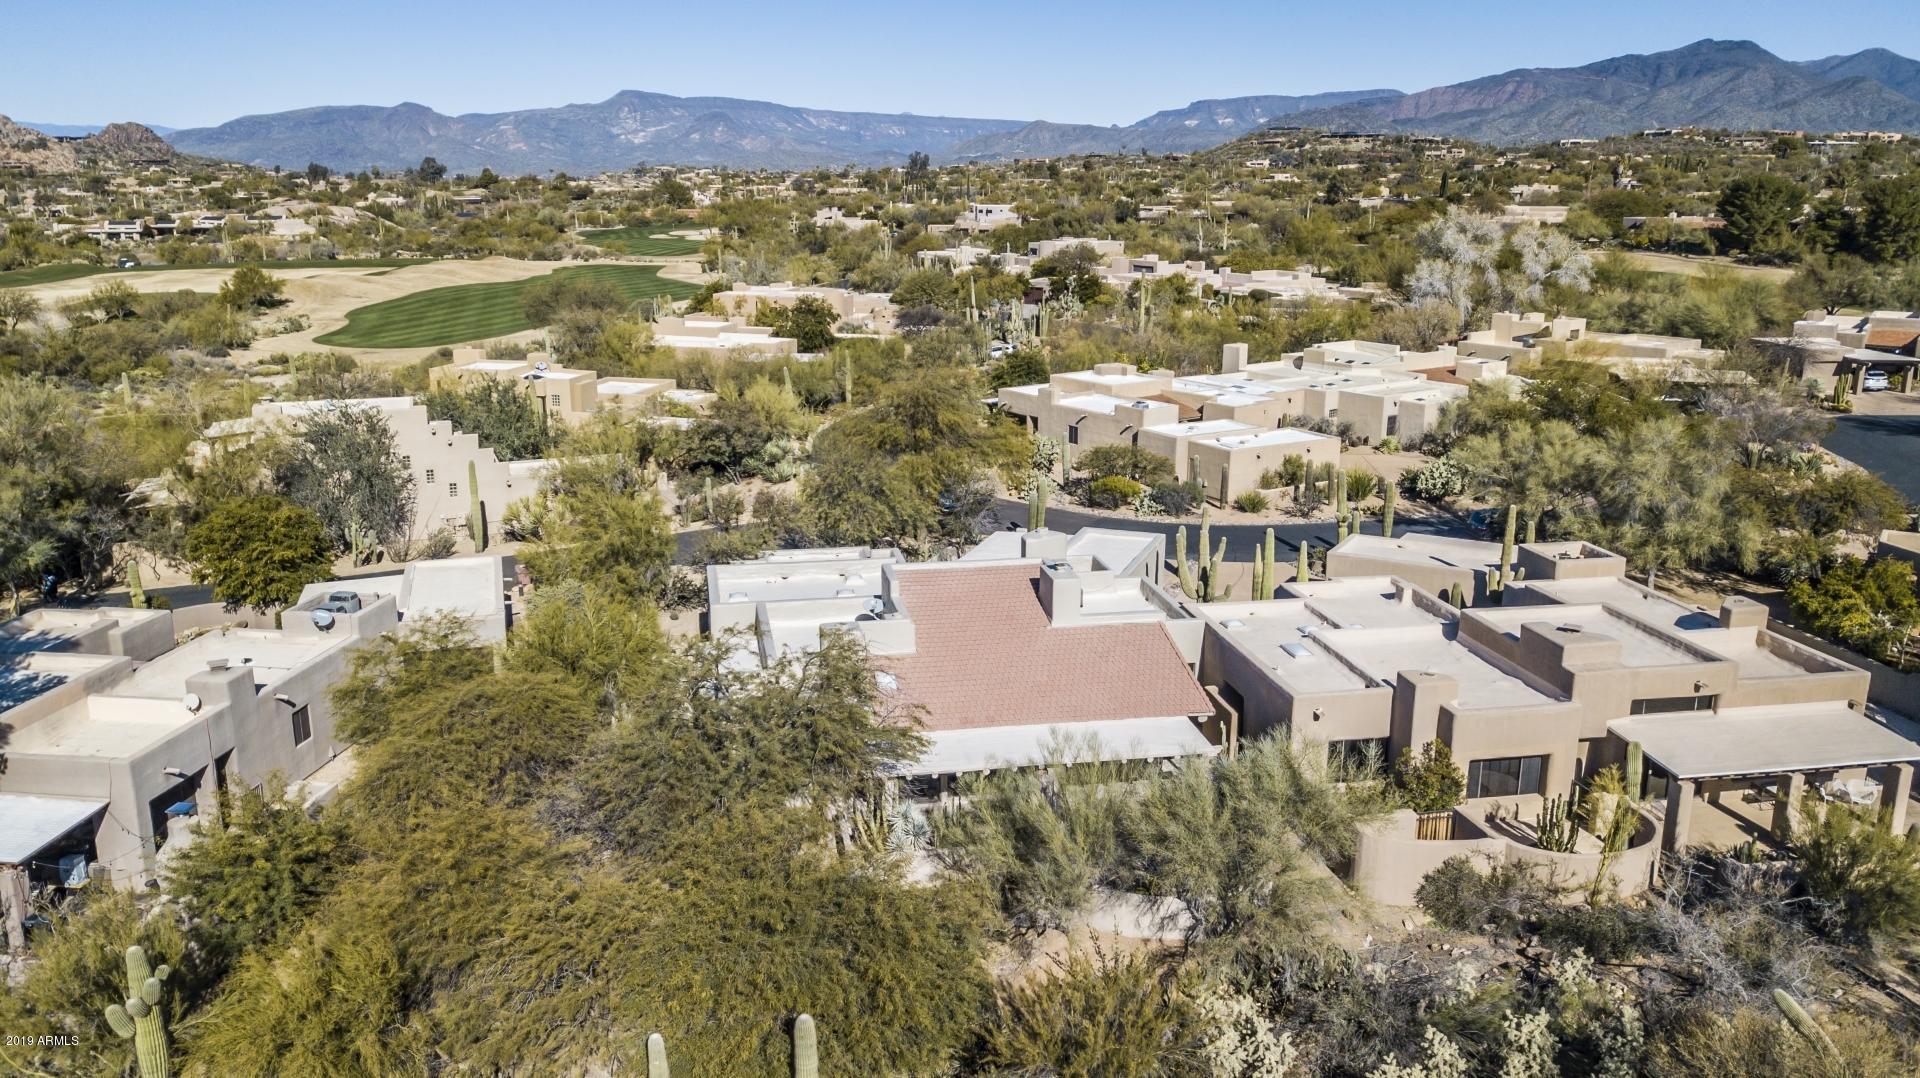 MLS 5873054 1617 N QUARTZ VALLEY Road, Scottsdale, AZ 85266 Scottsdale AZ The Boulders